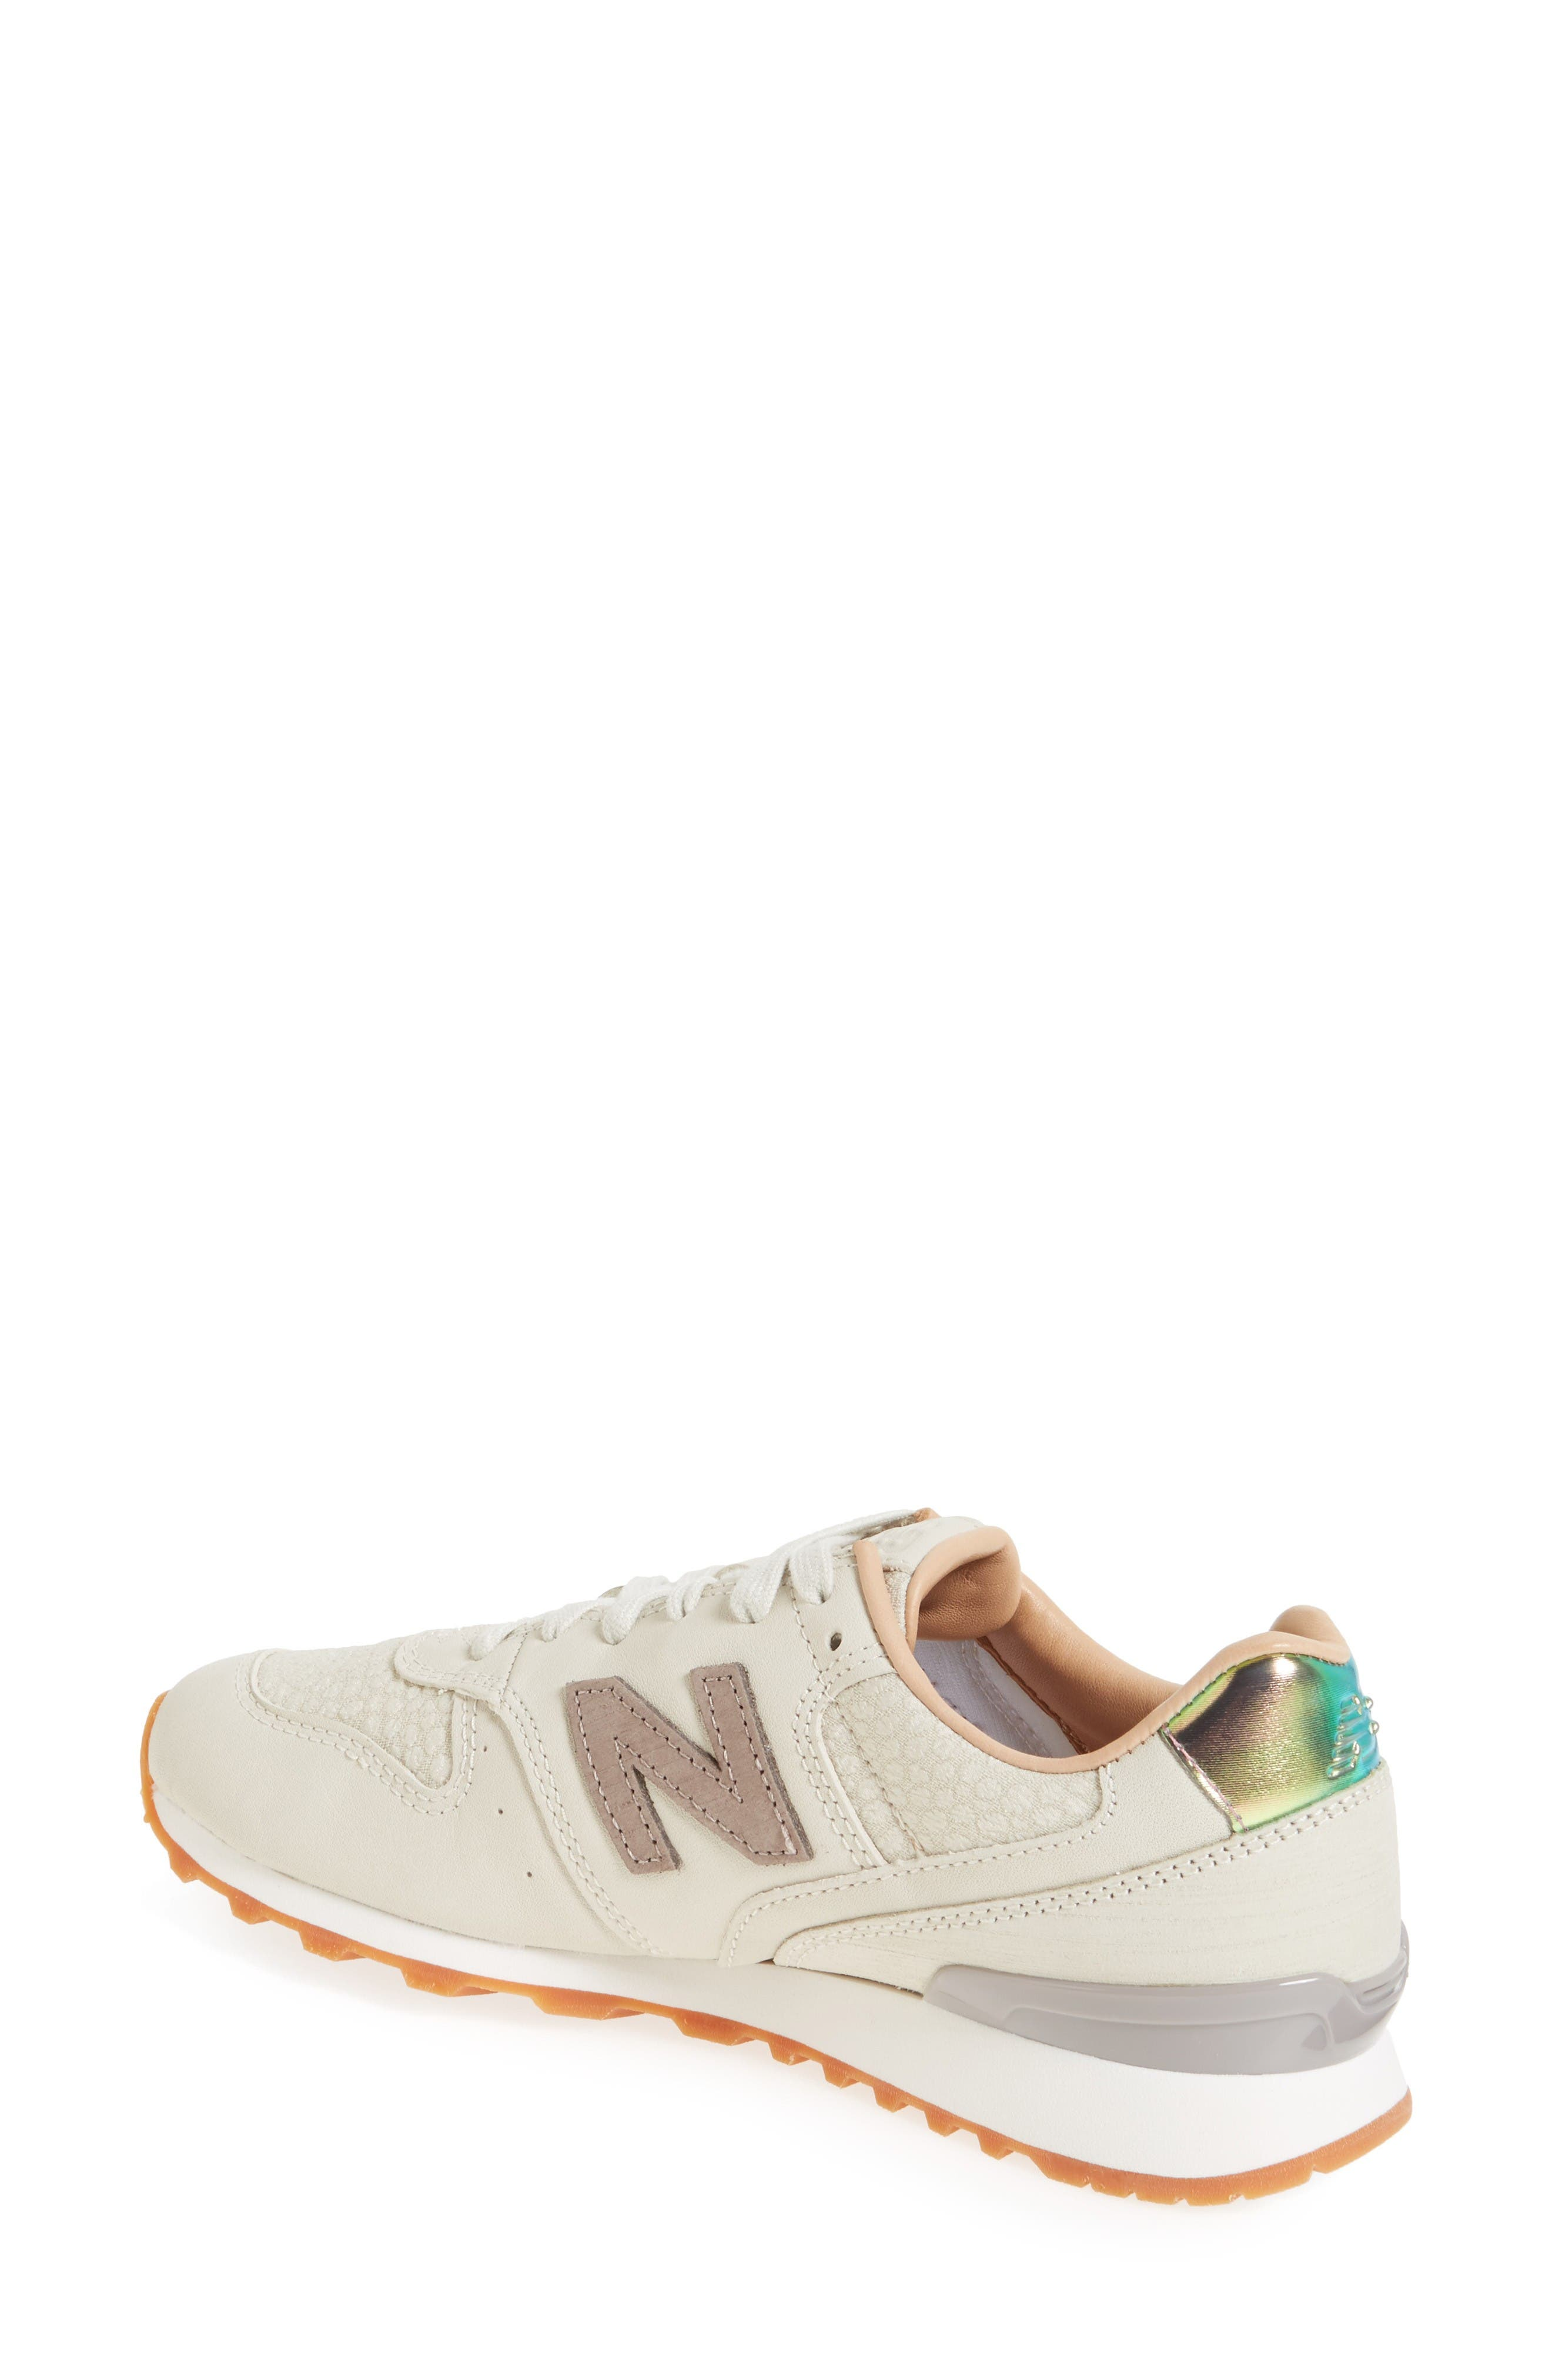 696 Sneaker,                             Alternate thumbnail 2, color,                             Powder